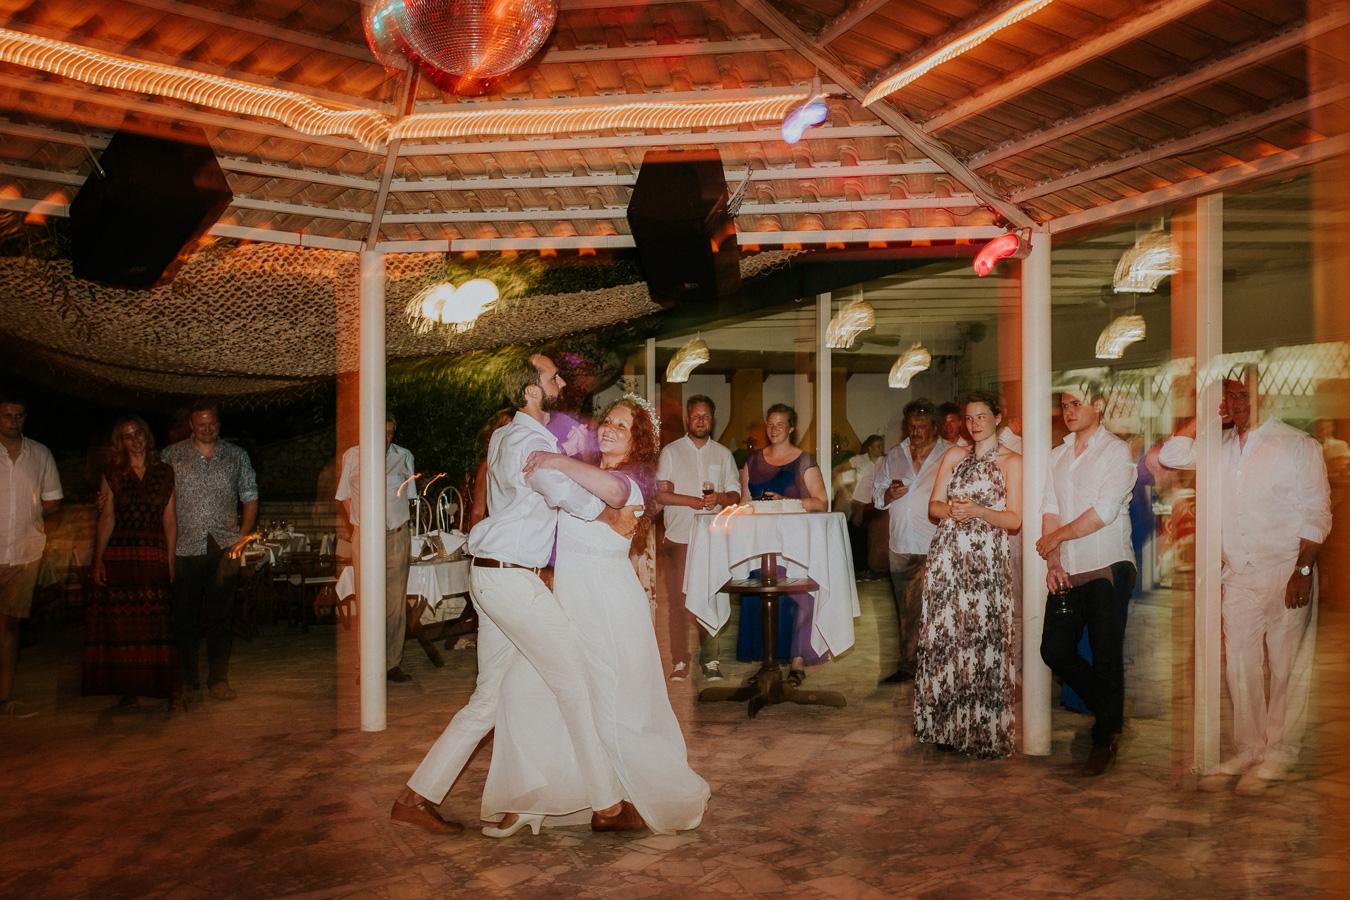 109-bryllupsfotograf-oslo-destinasjonsbryllup-fotograf-tone-tvedt.jpg